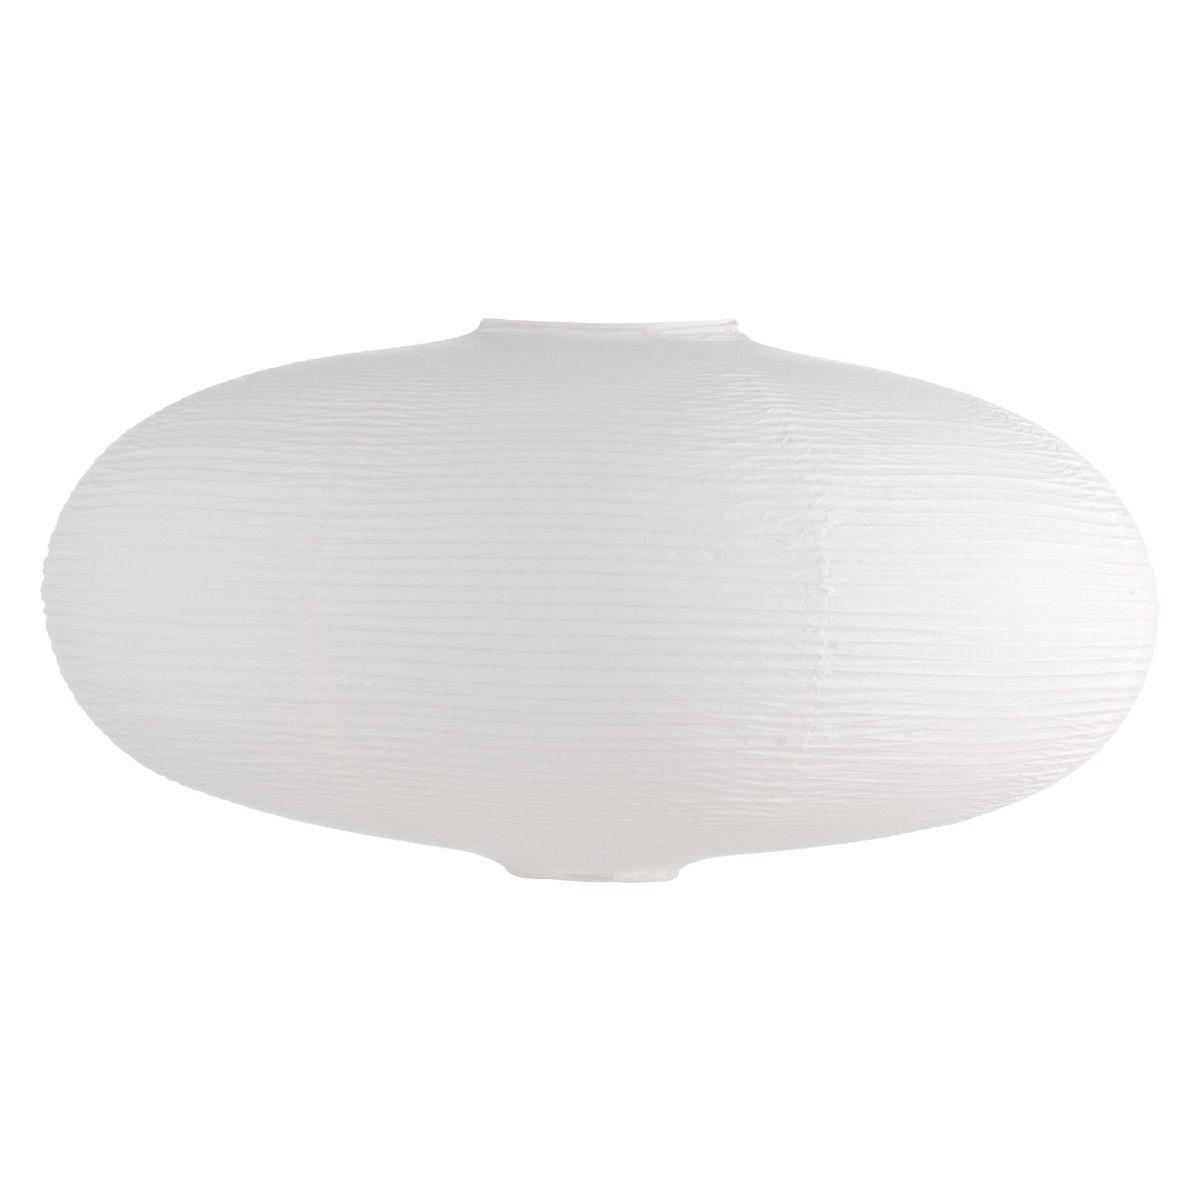 SHIRO White paper ceiling light shade   Buy now at Habitat UK